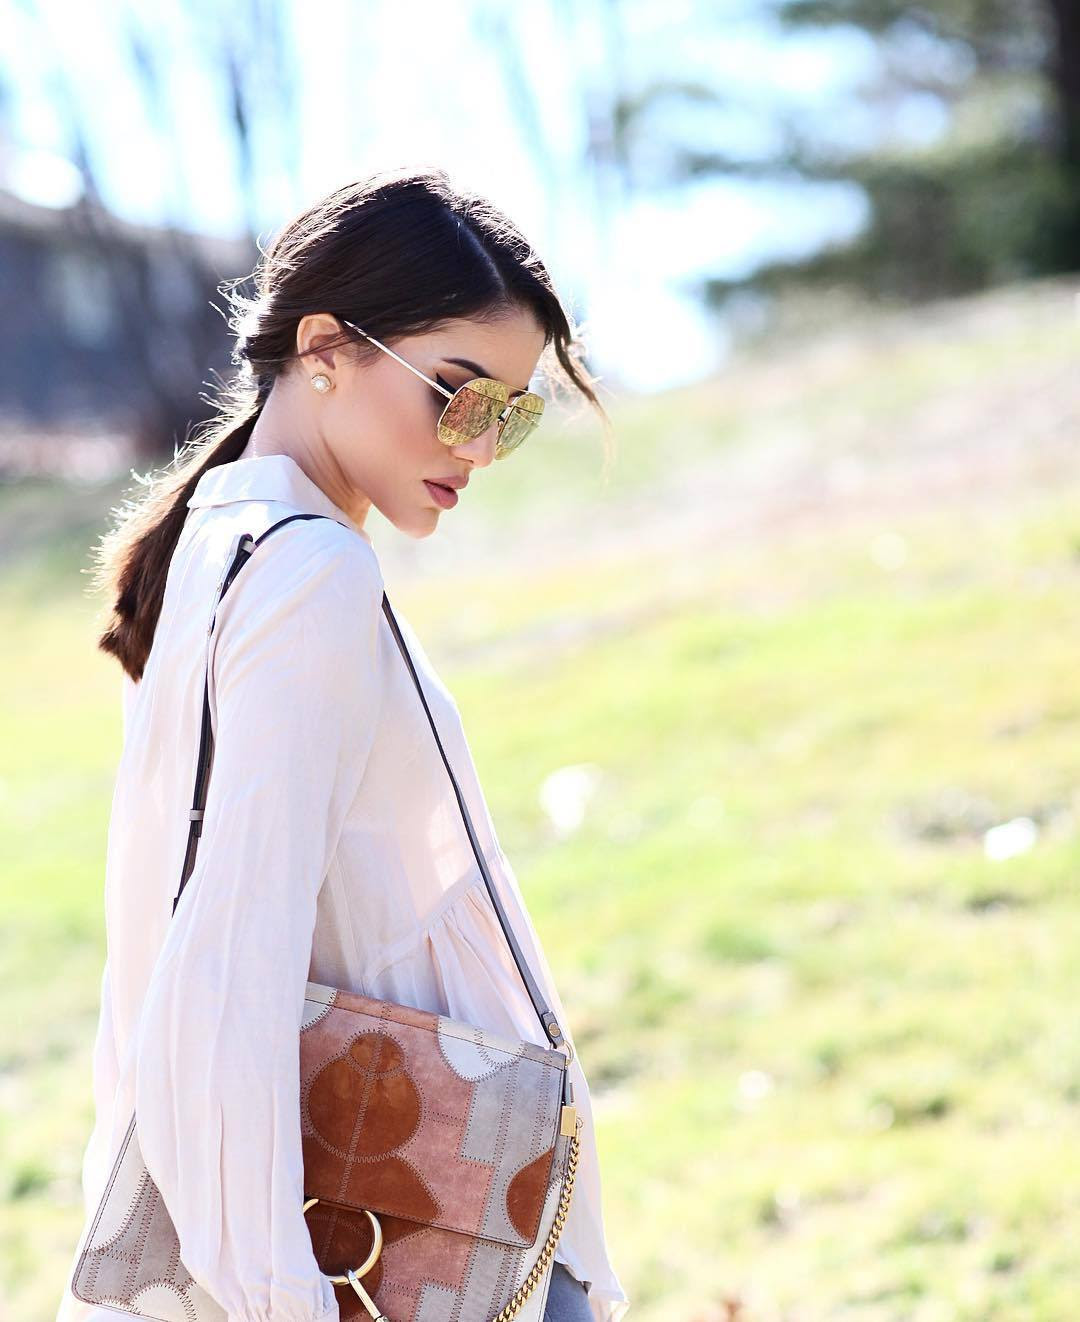 "fashion-clue: "" stylishblogger: "" Feels like spring in New England!💛 —- Dia lindo por aqui - venha primavera sua linda! Haha by @camilacoelho "" www.fashionclue.net| Fashion Tumblr, Street Wear & Outfits """